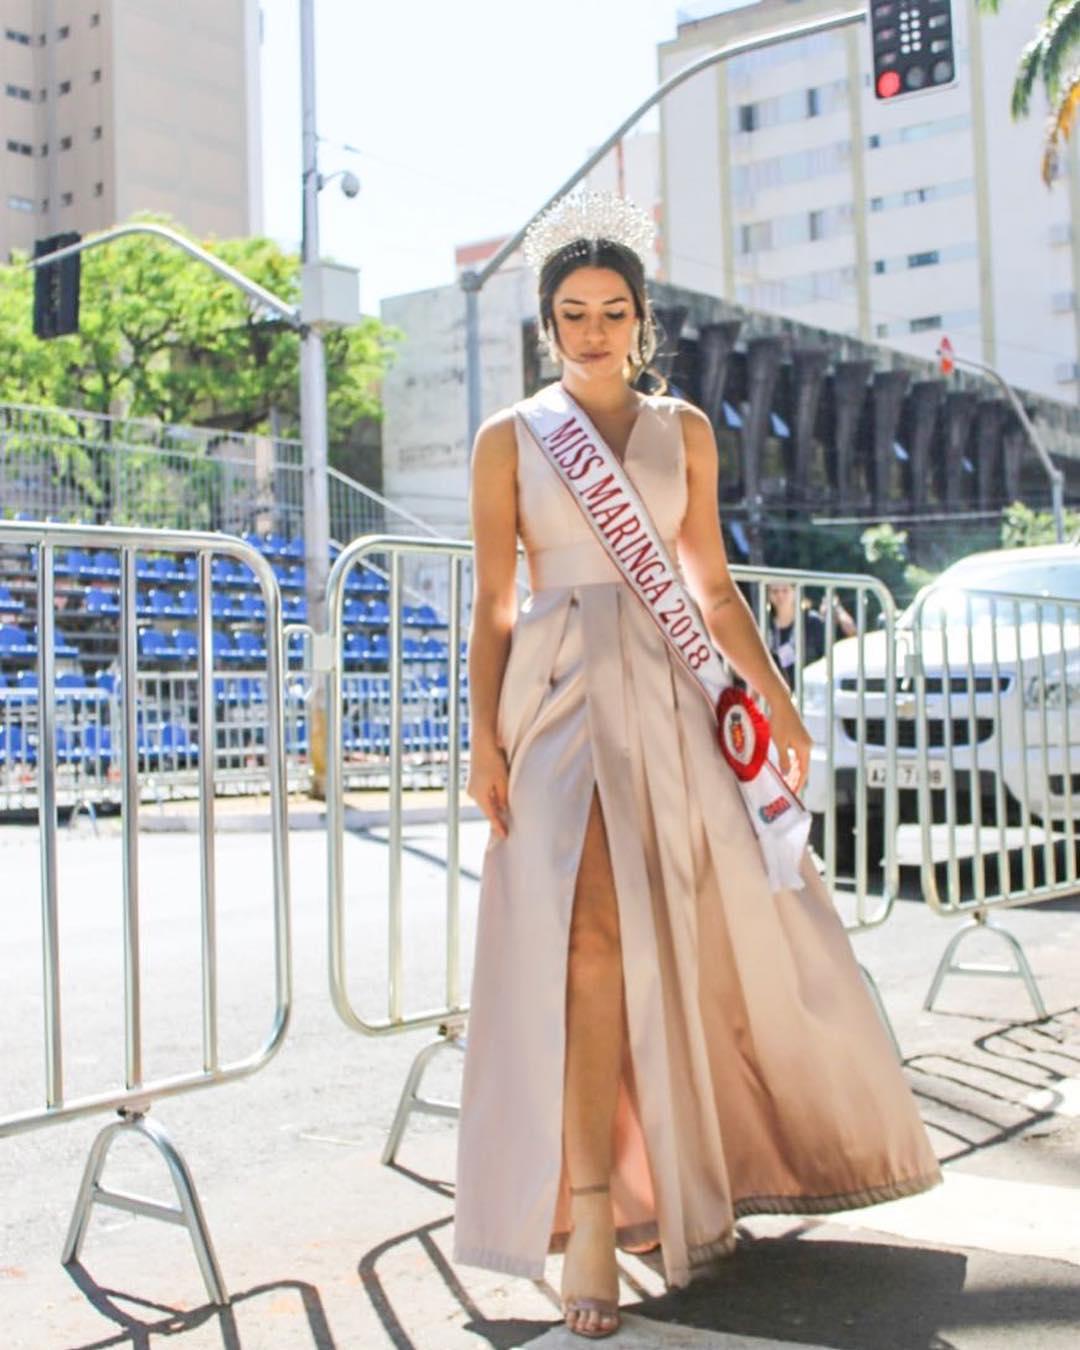 thais de mello candido, miss tourism world brazil 2018. 39946310